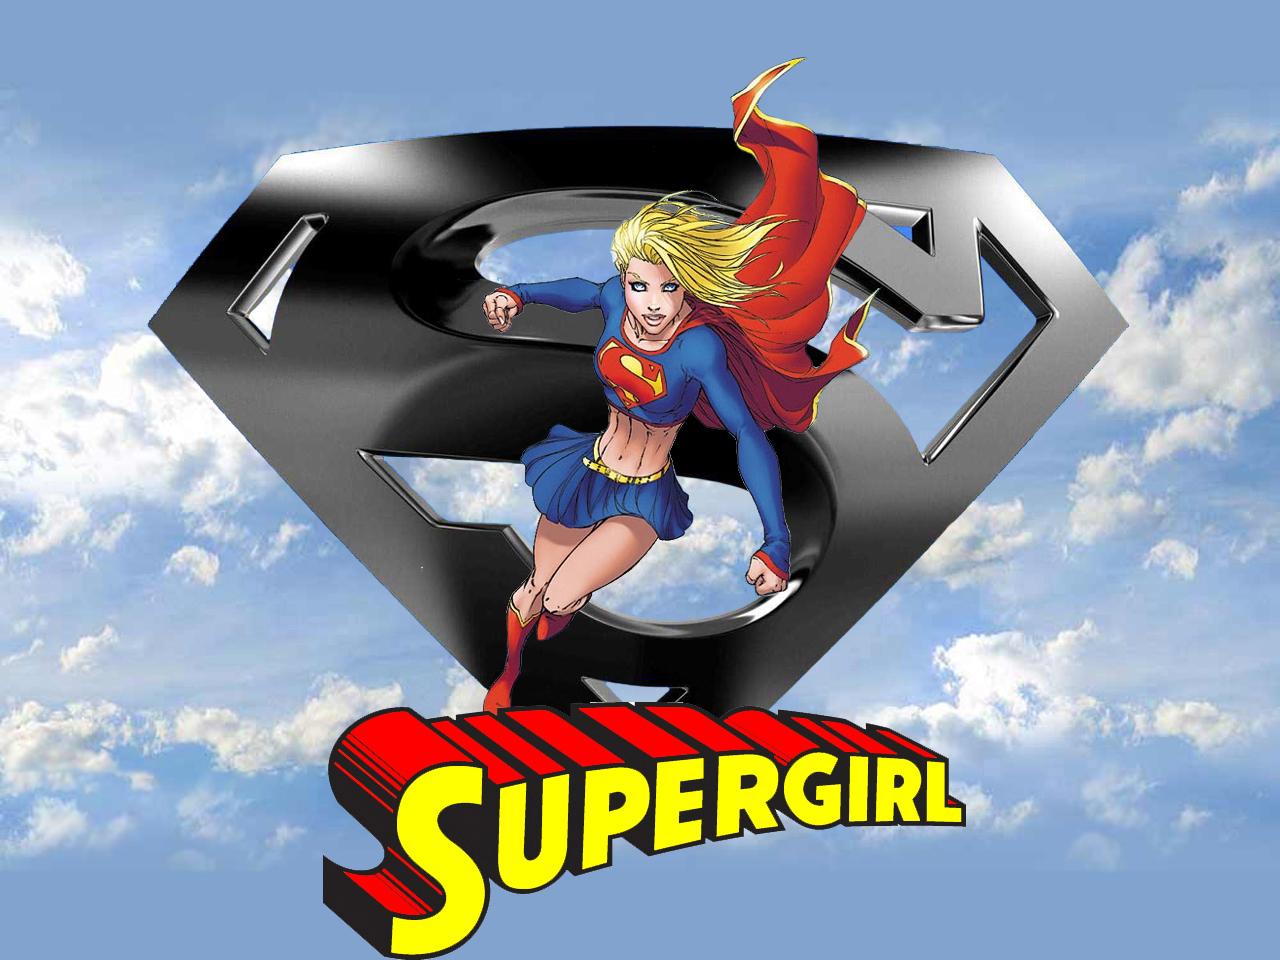 supergirl wallpaper by swfan1977 on deviantart